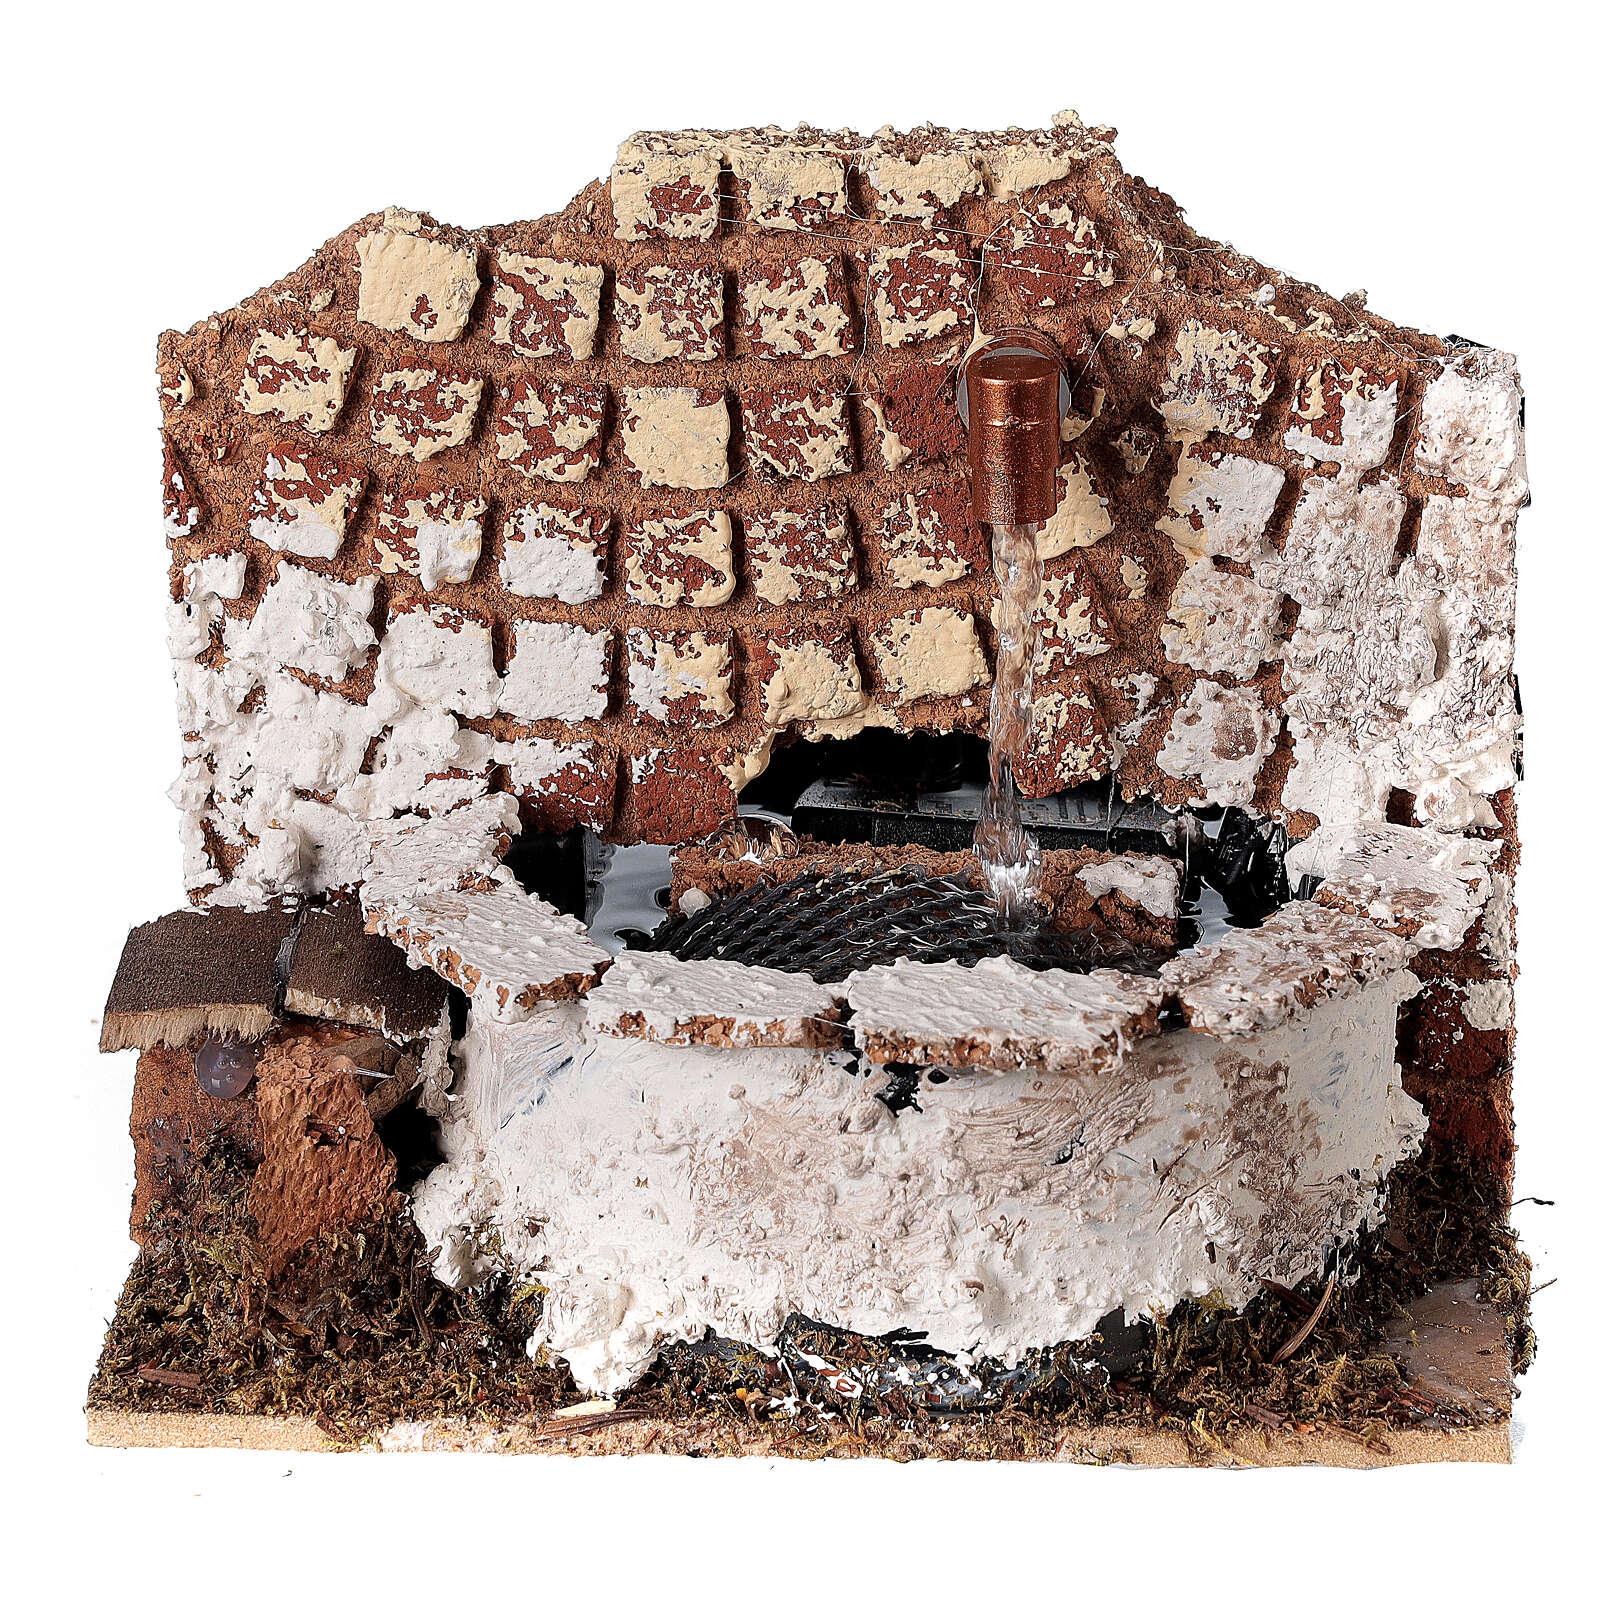 Circular fountain with pump 10x15x10 cm for Nativity scene 8-10 cm 4